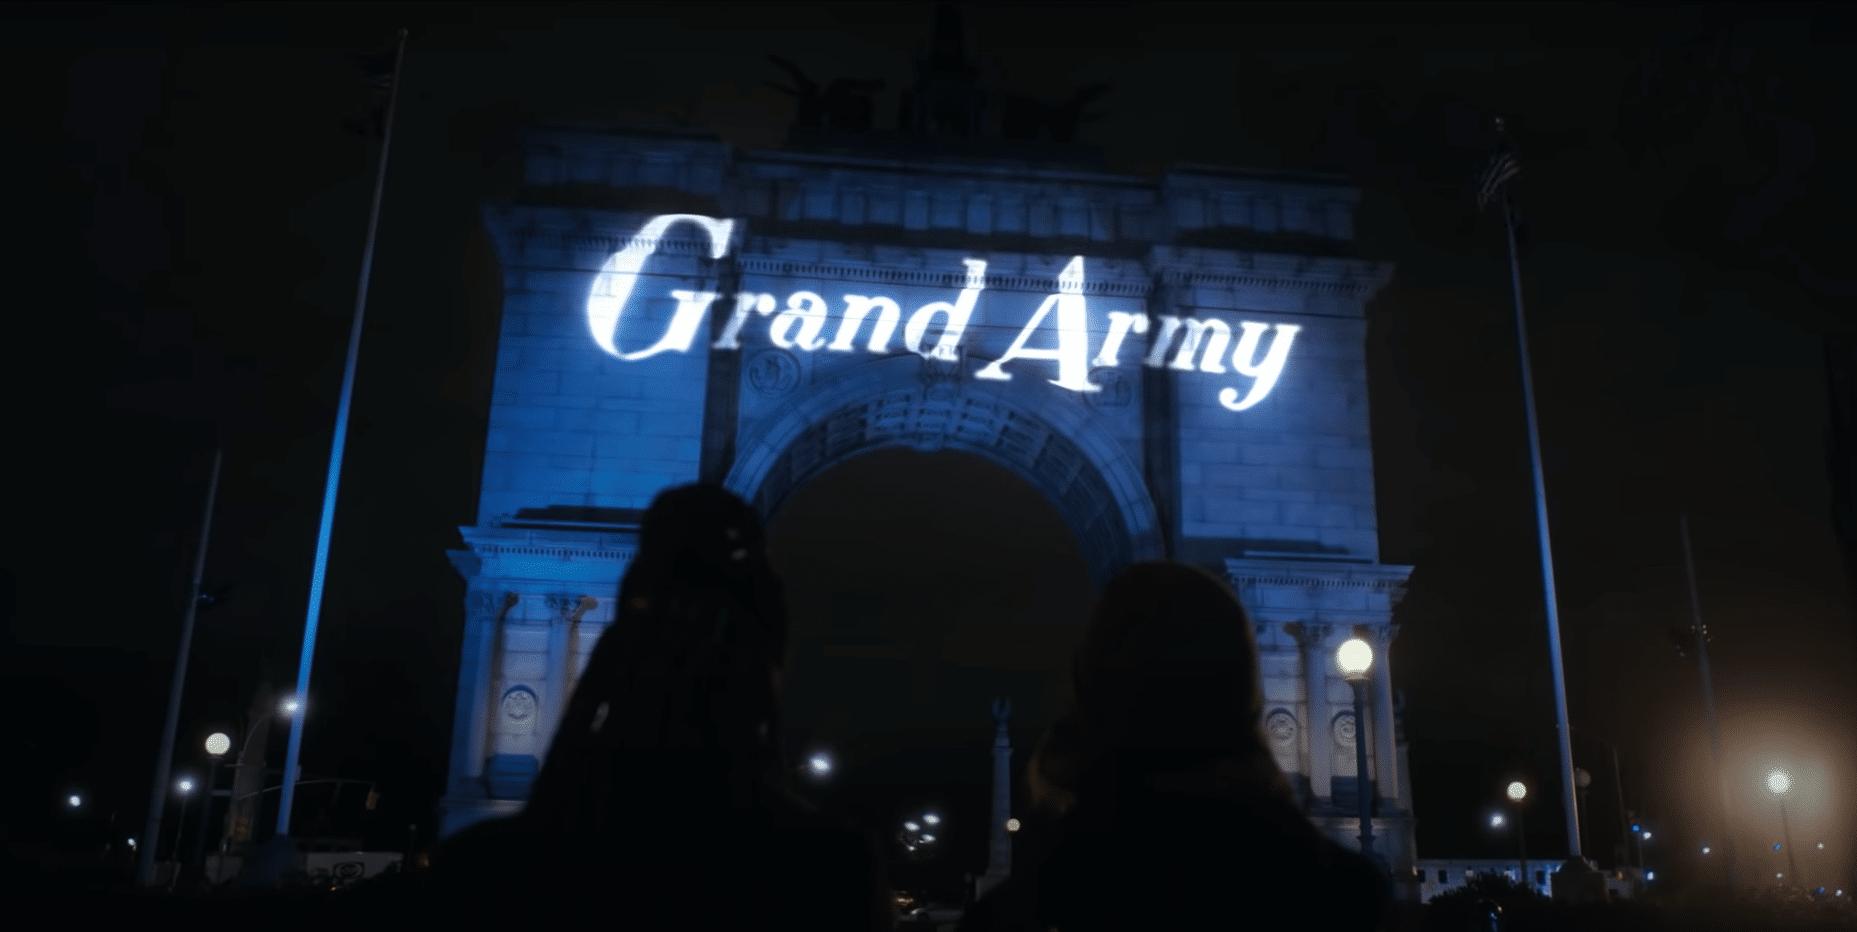 Grand Army Trailer